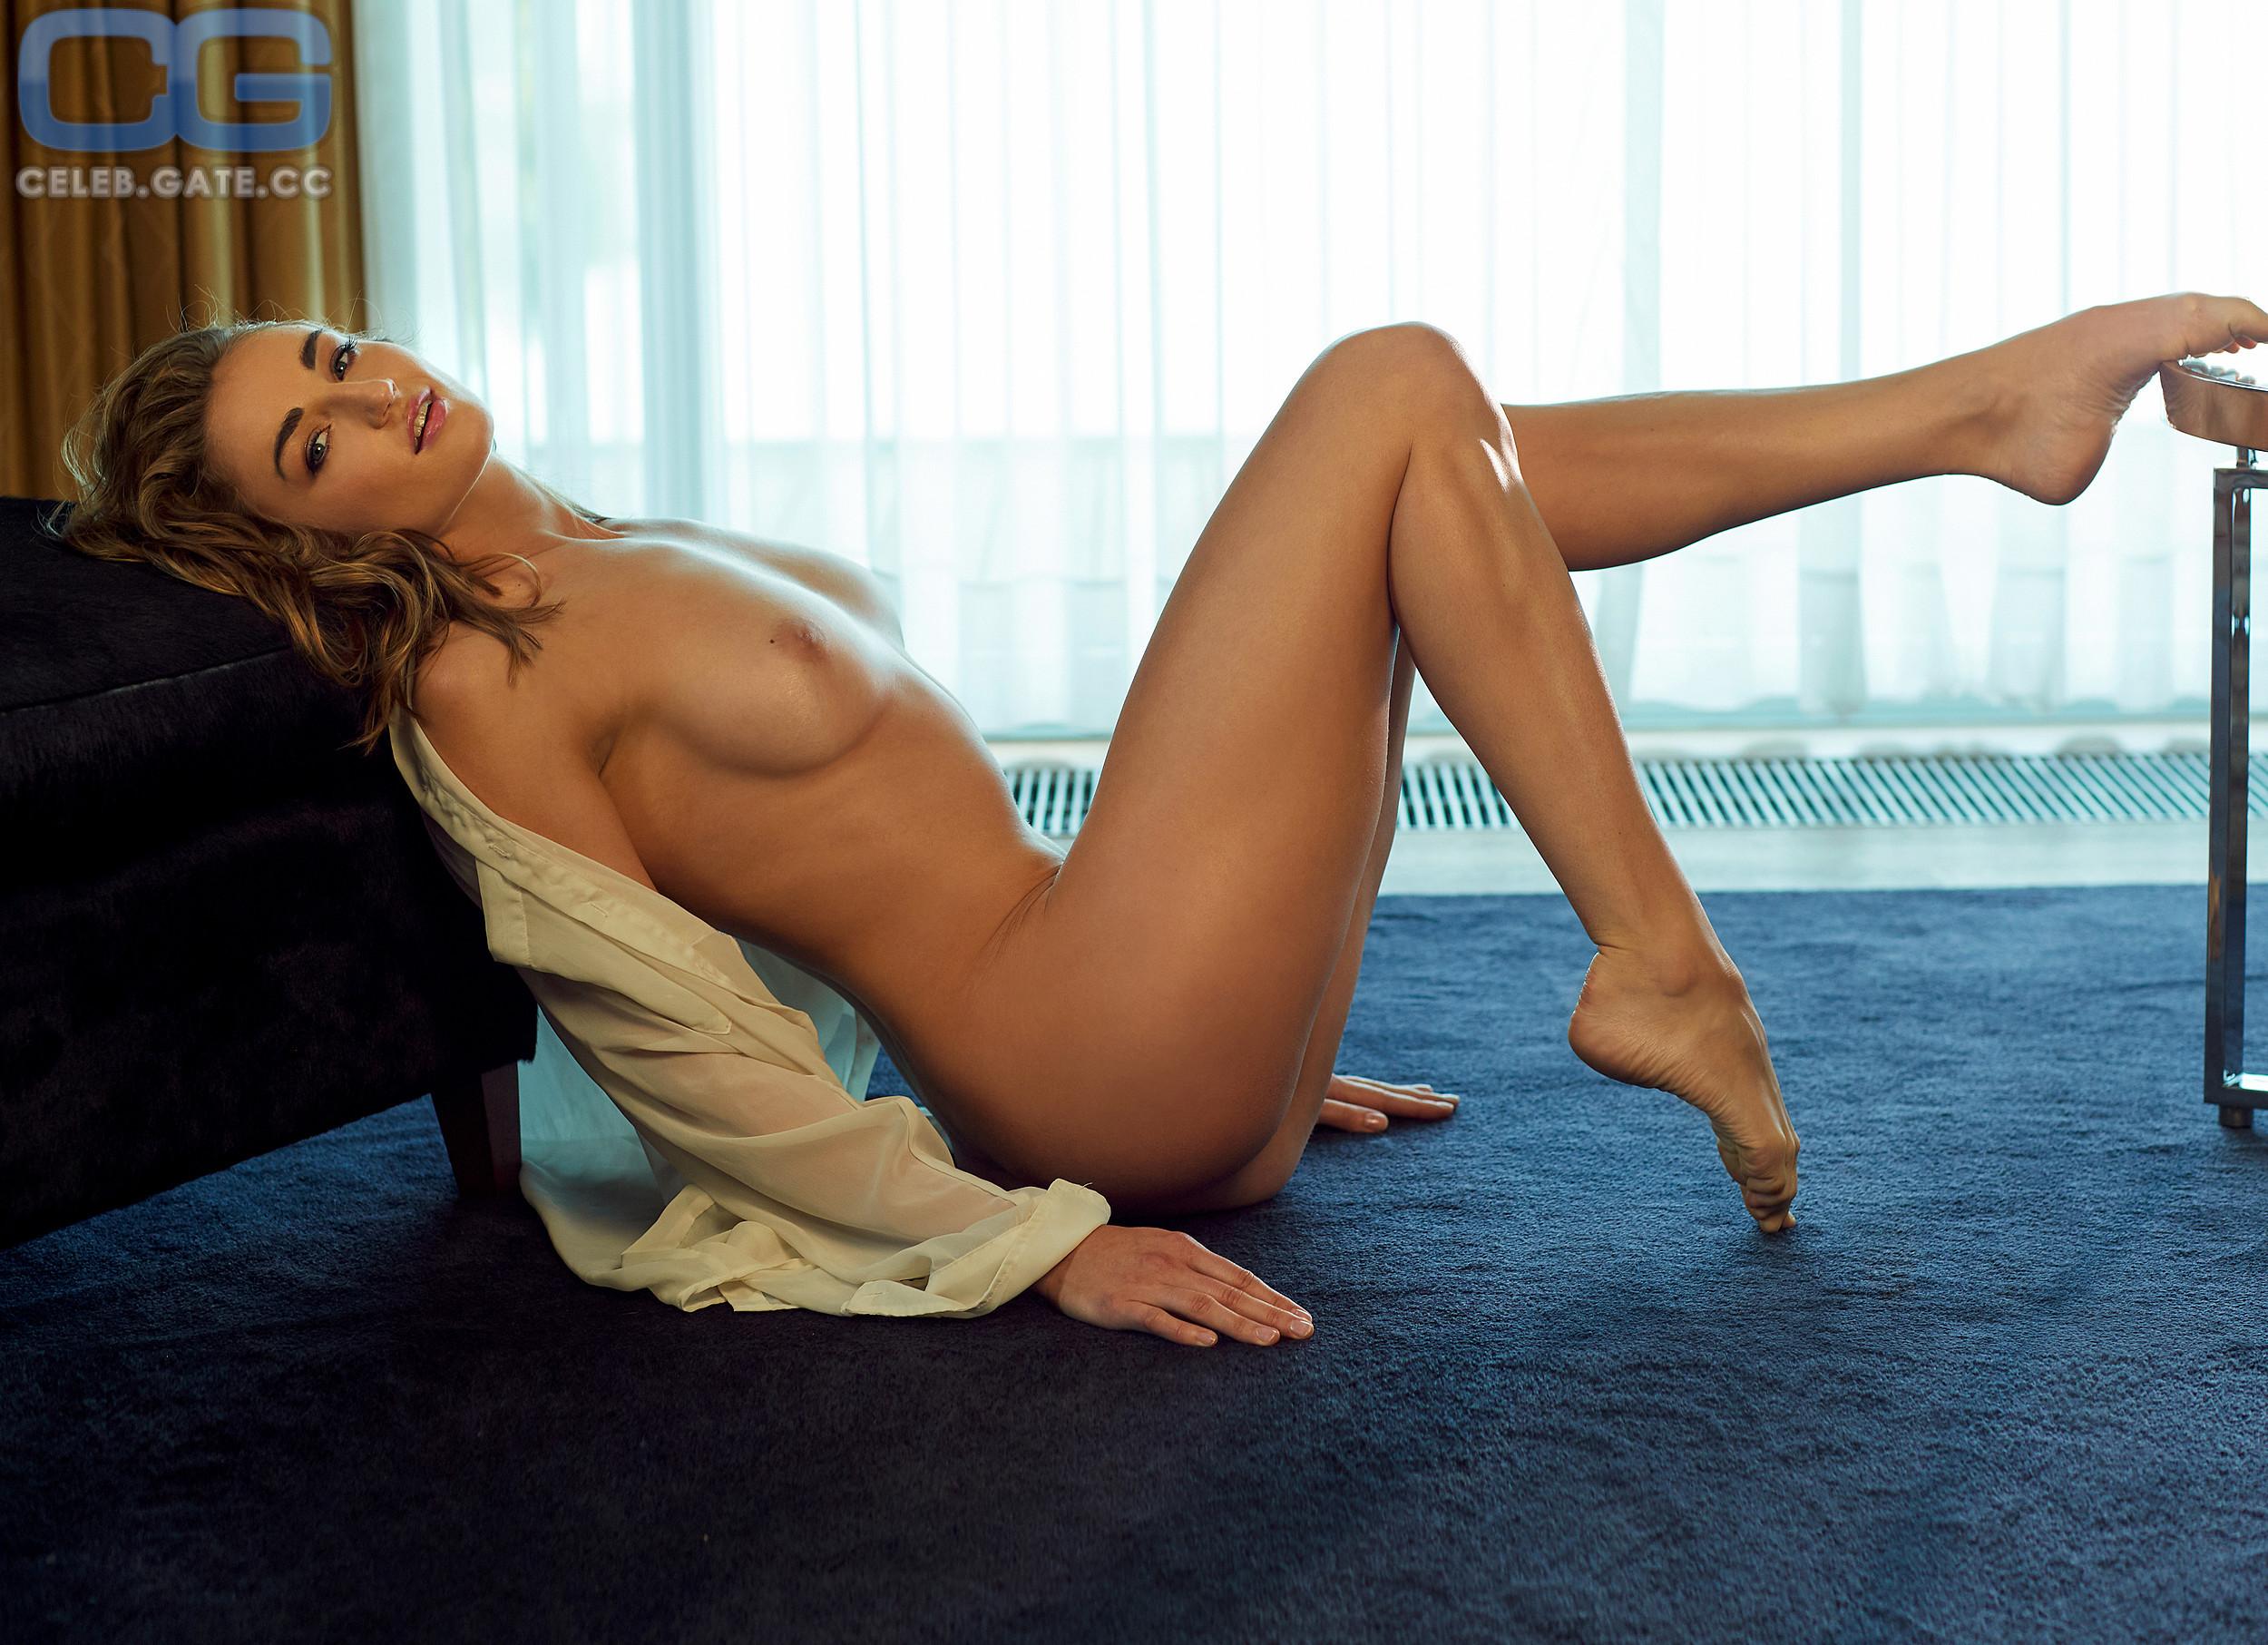 nackt Krawzow Elena Paralympics star: